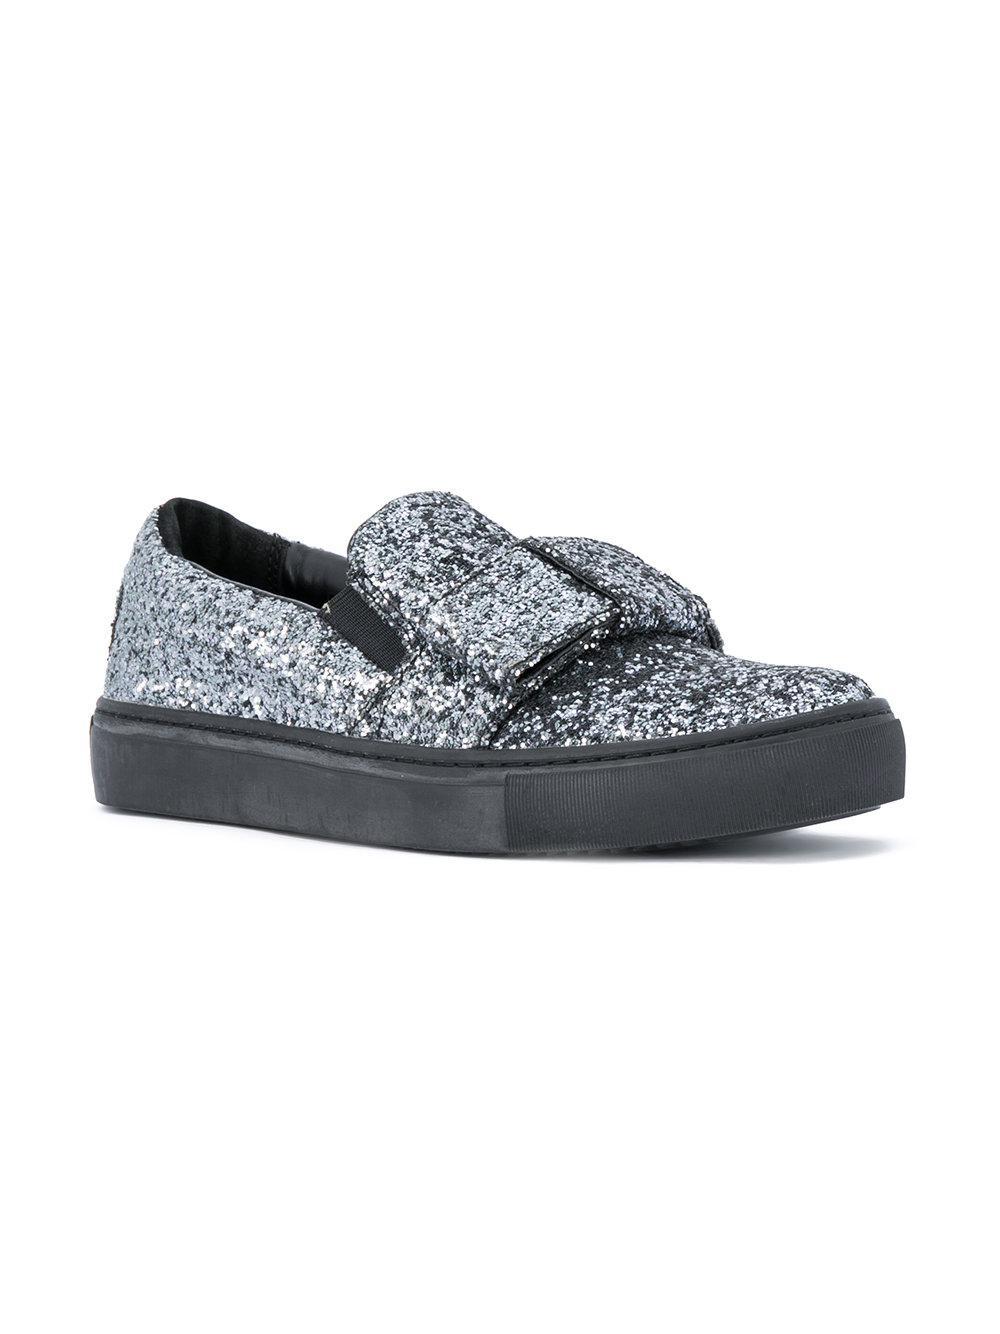 Karl Lagerfeld Leather Glitter Slip-on Sneakers in Metallic